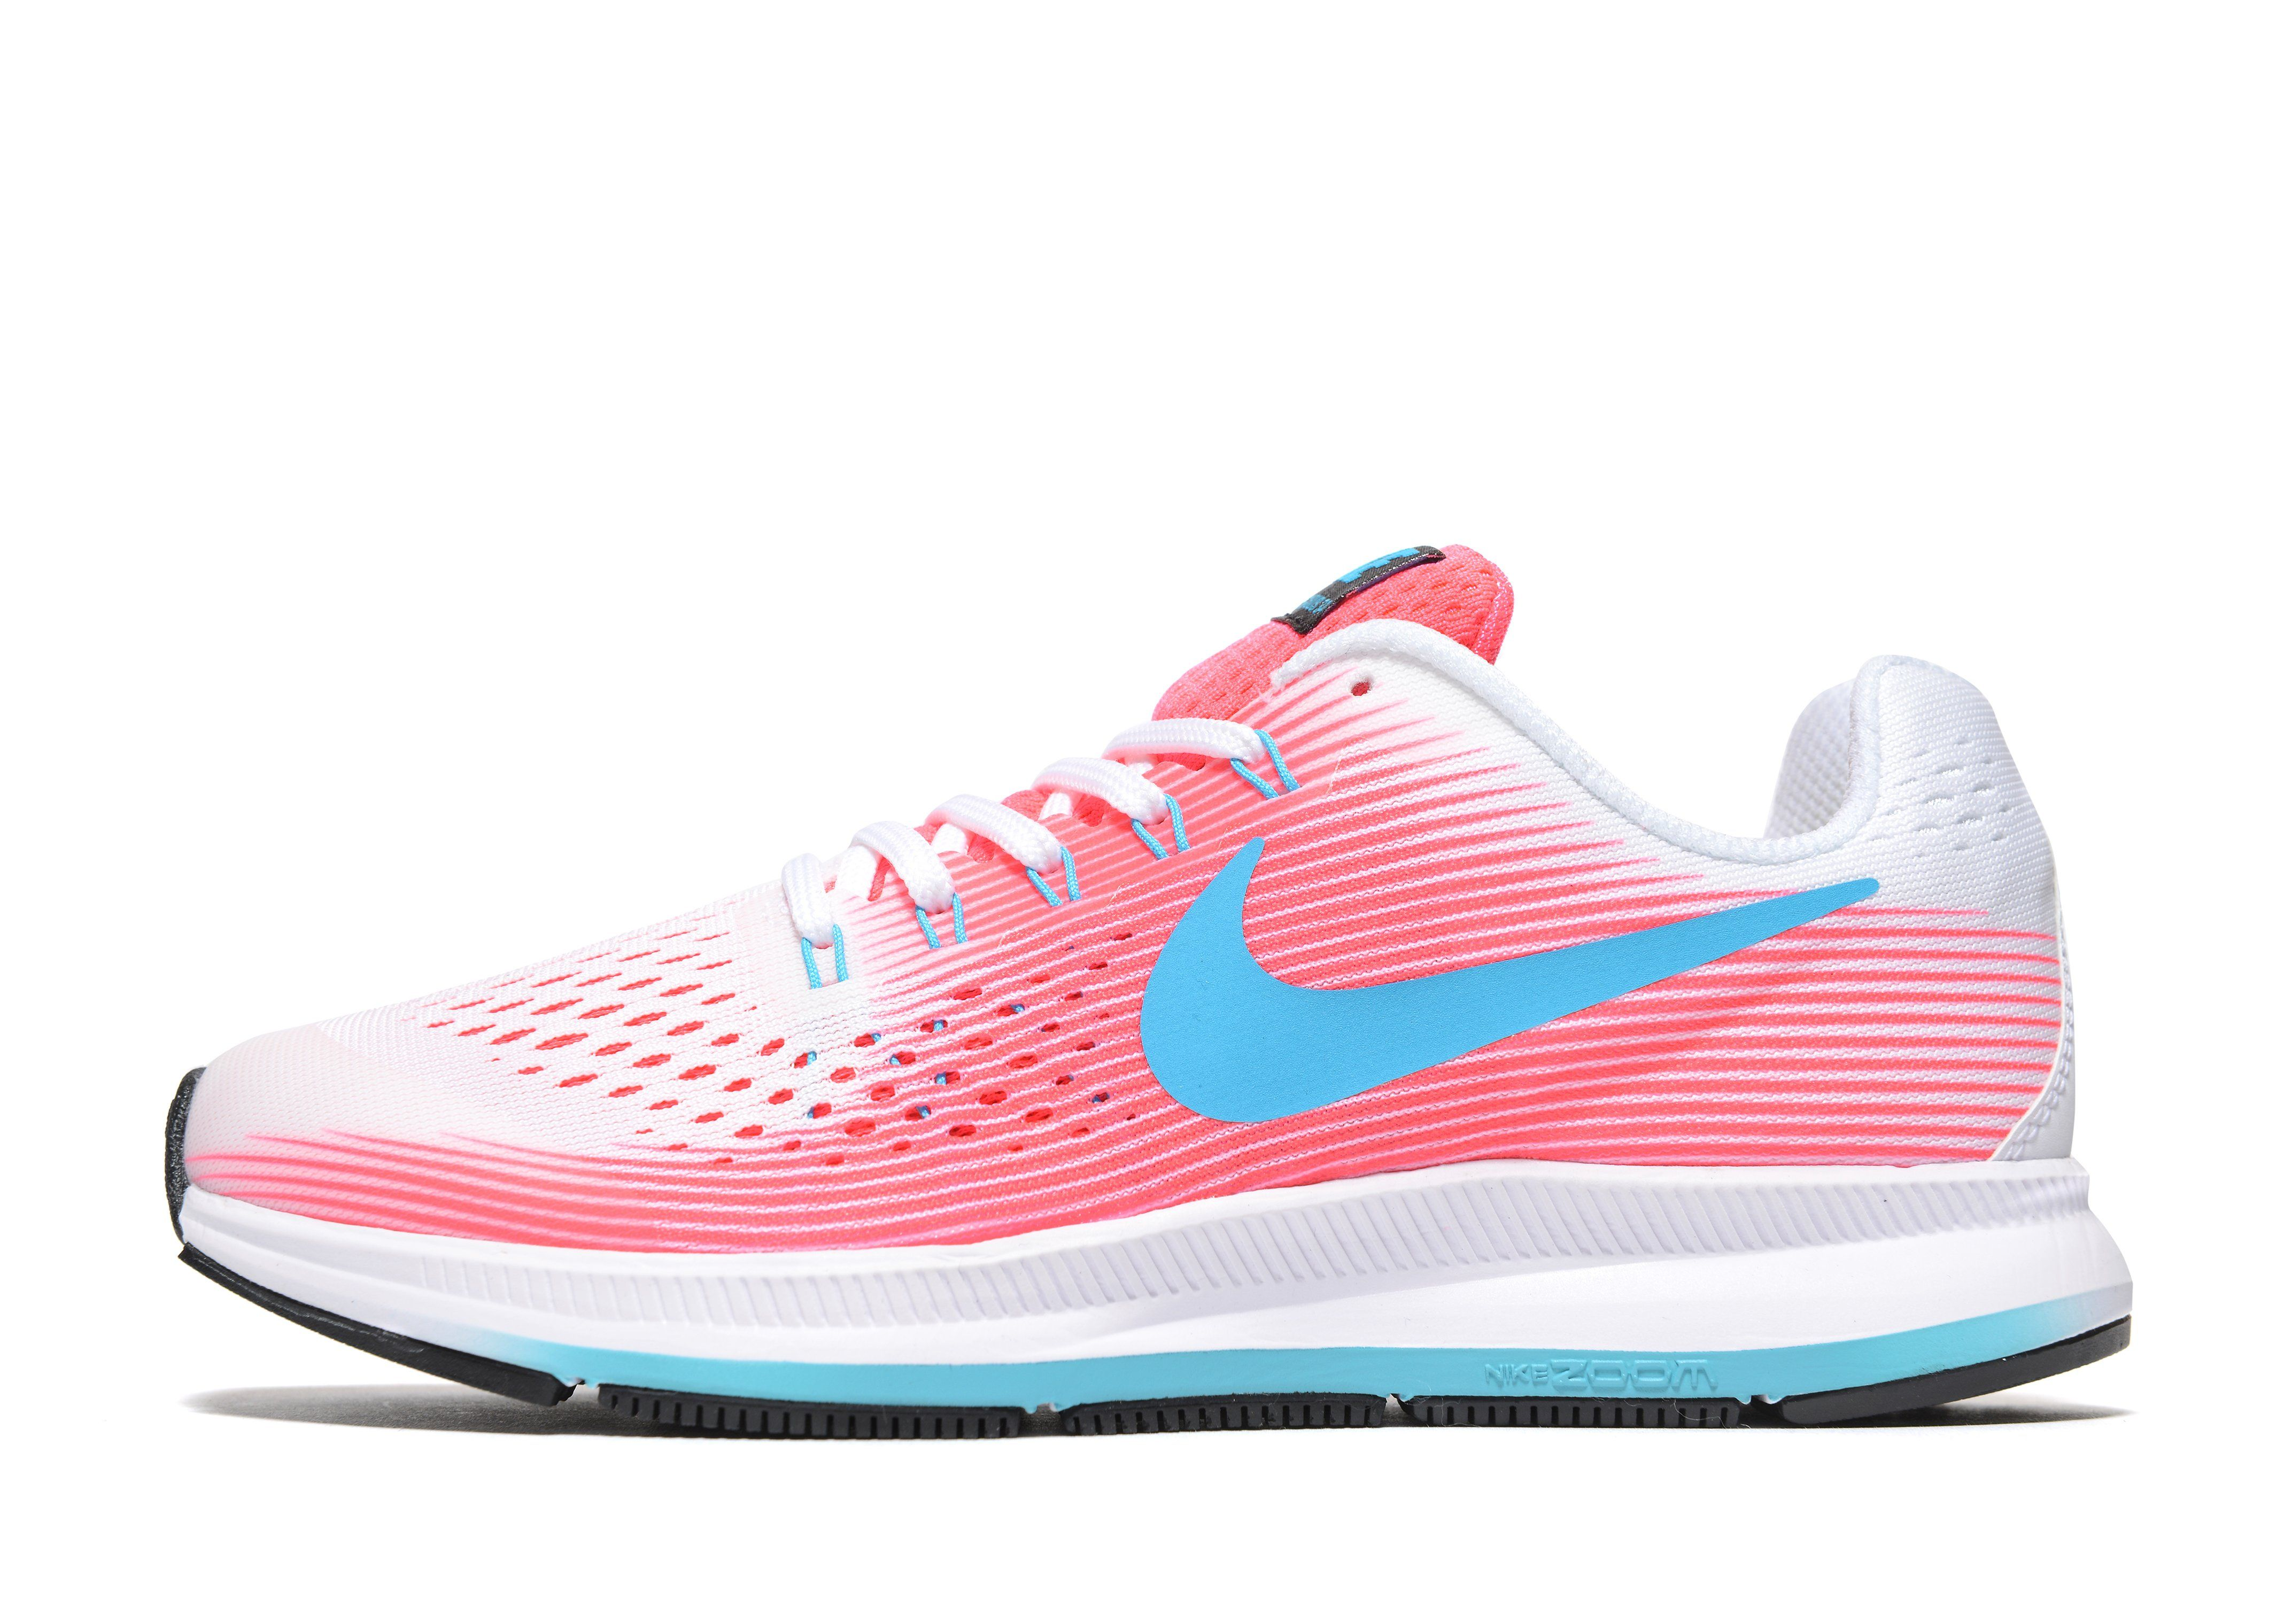 hot sale Nike Zoom Pegasus 34 Junior JD Sports